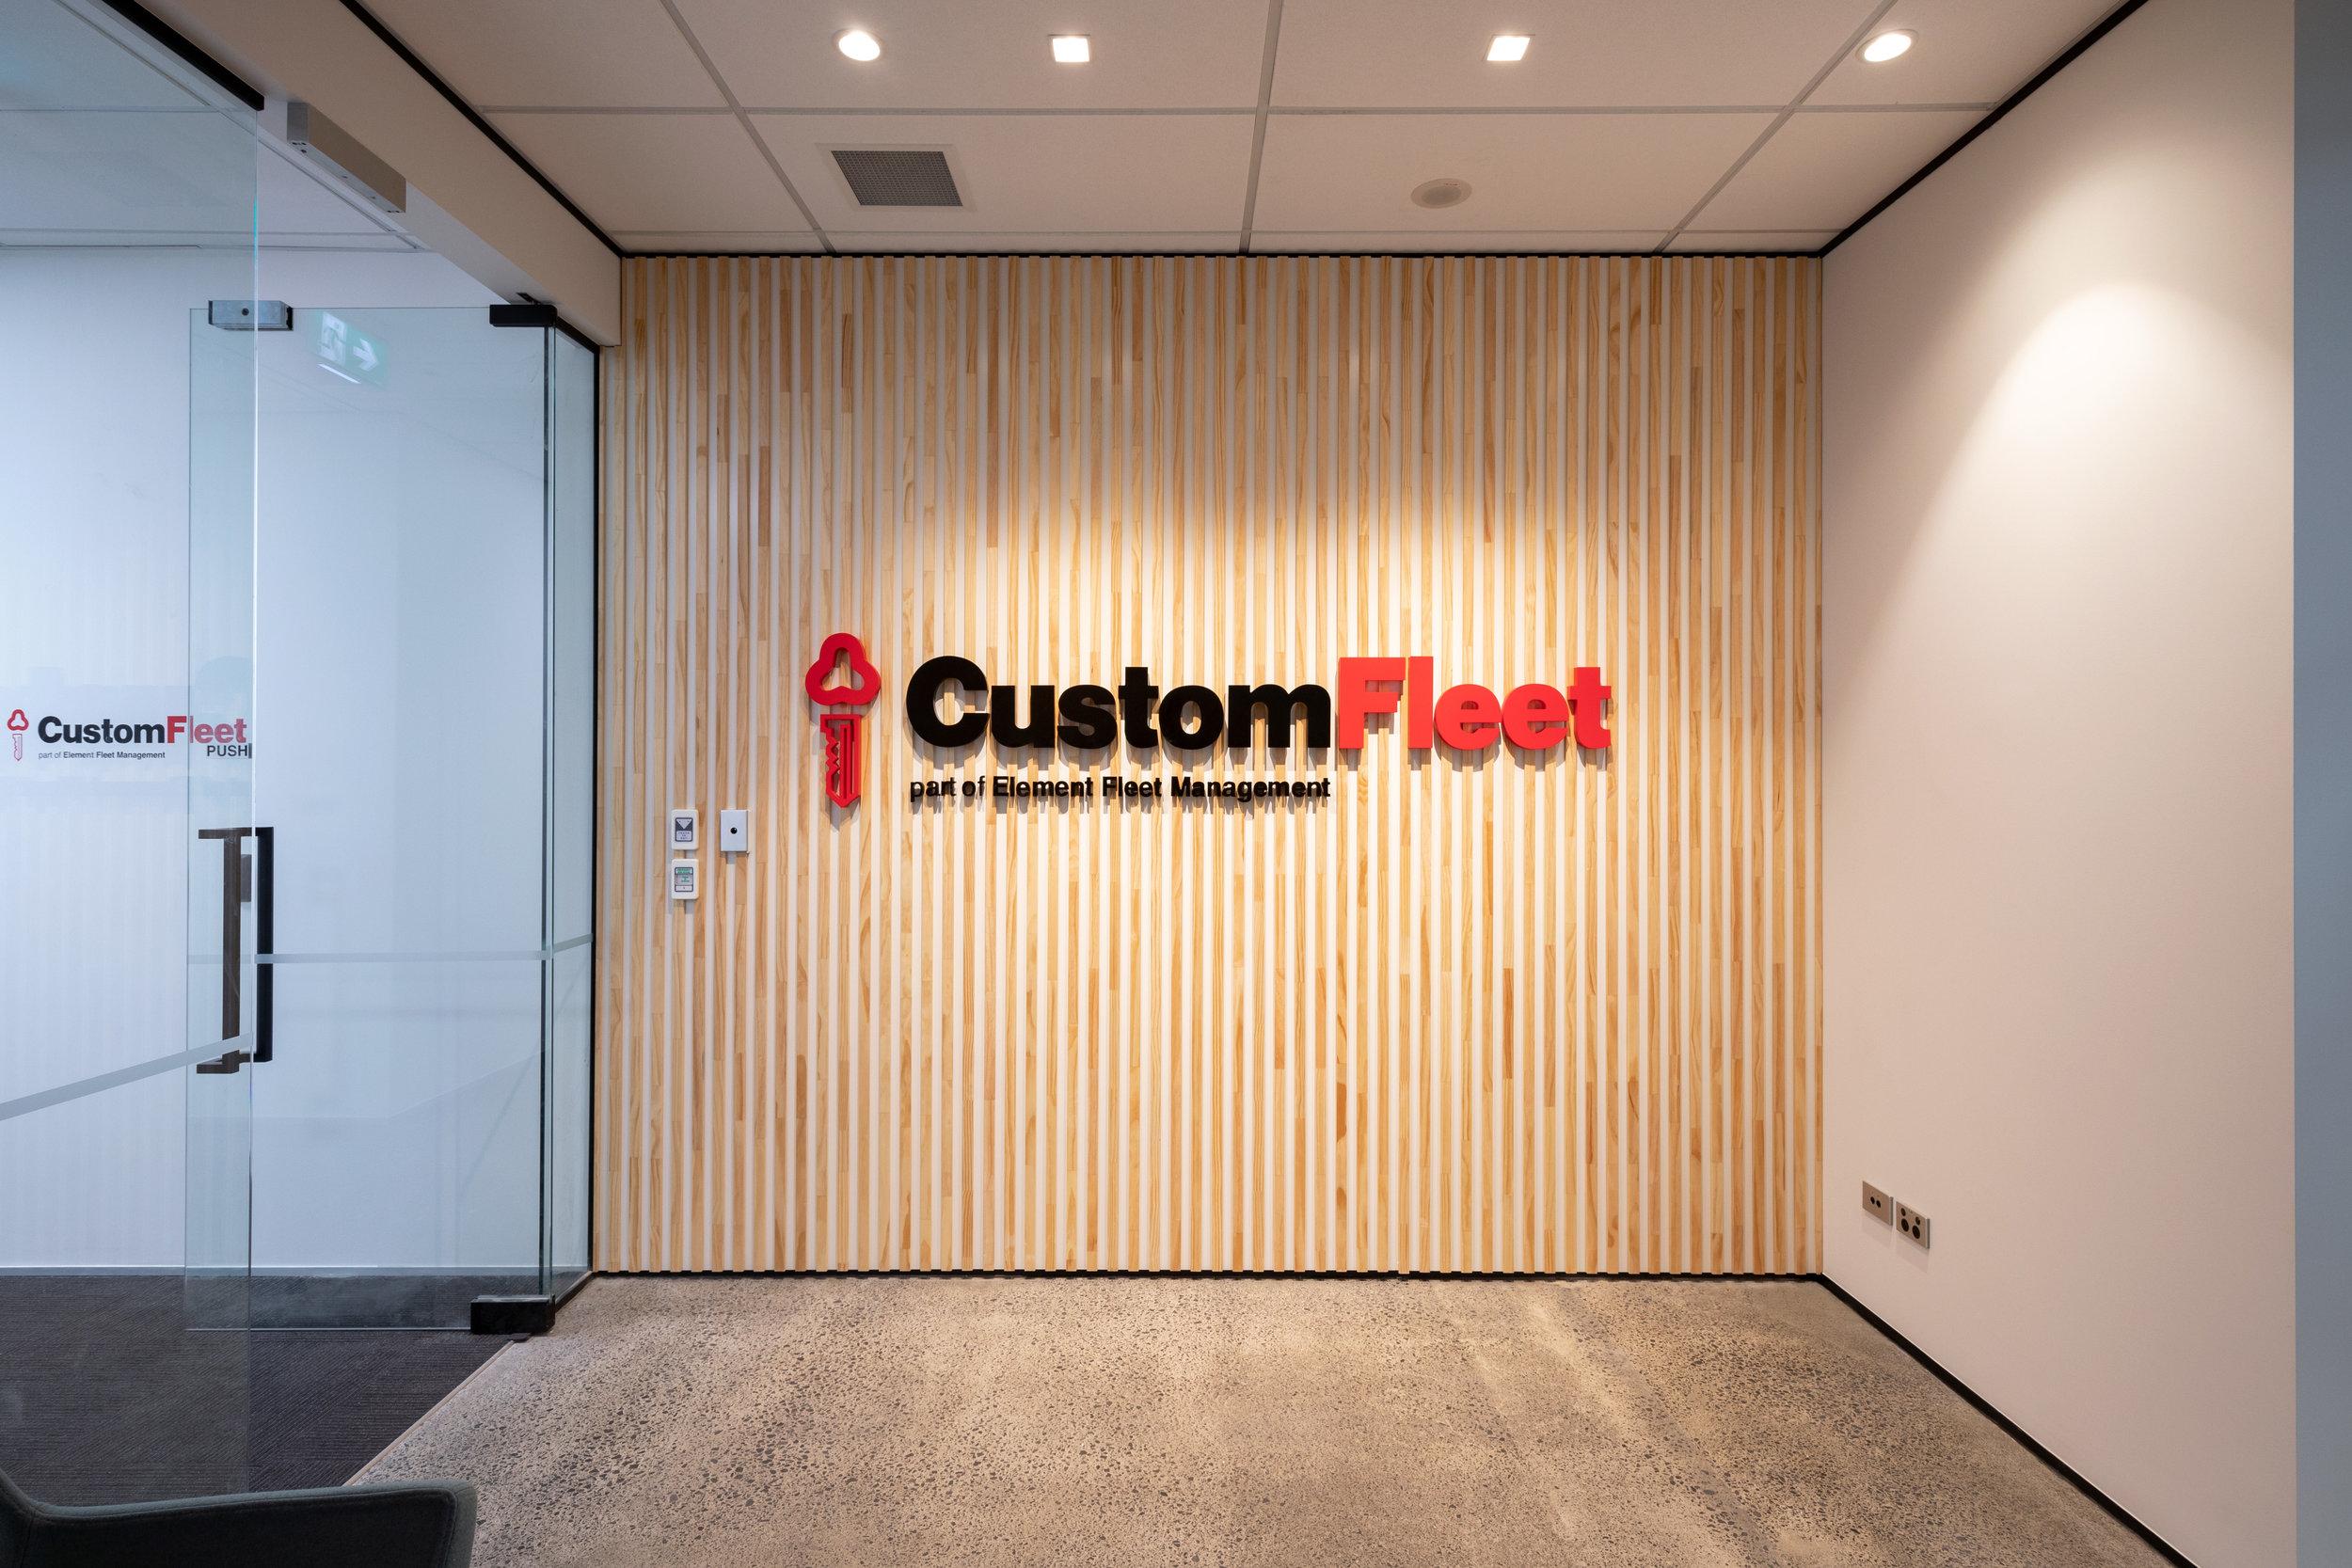 Custom Fleet